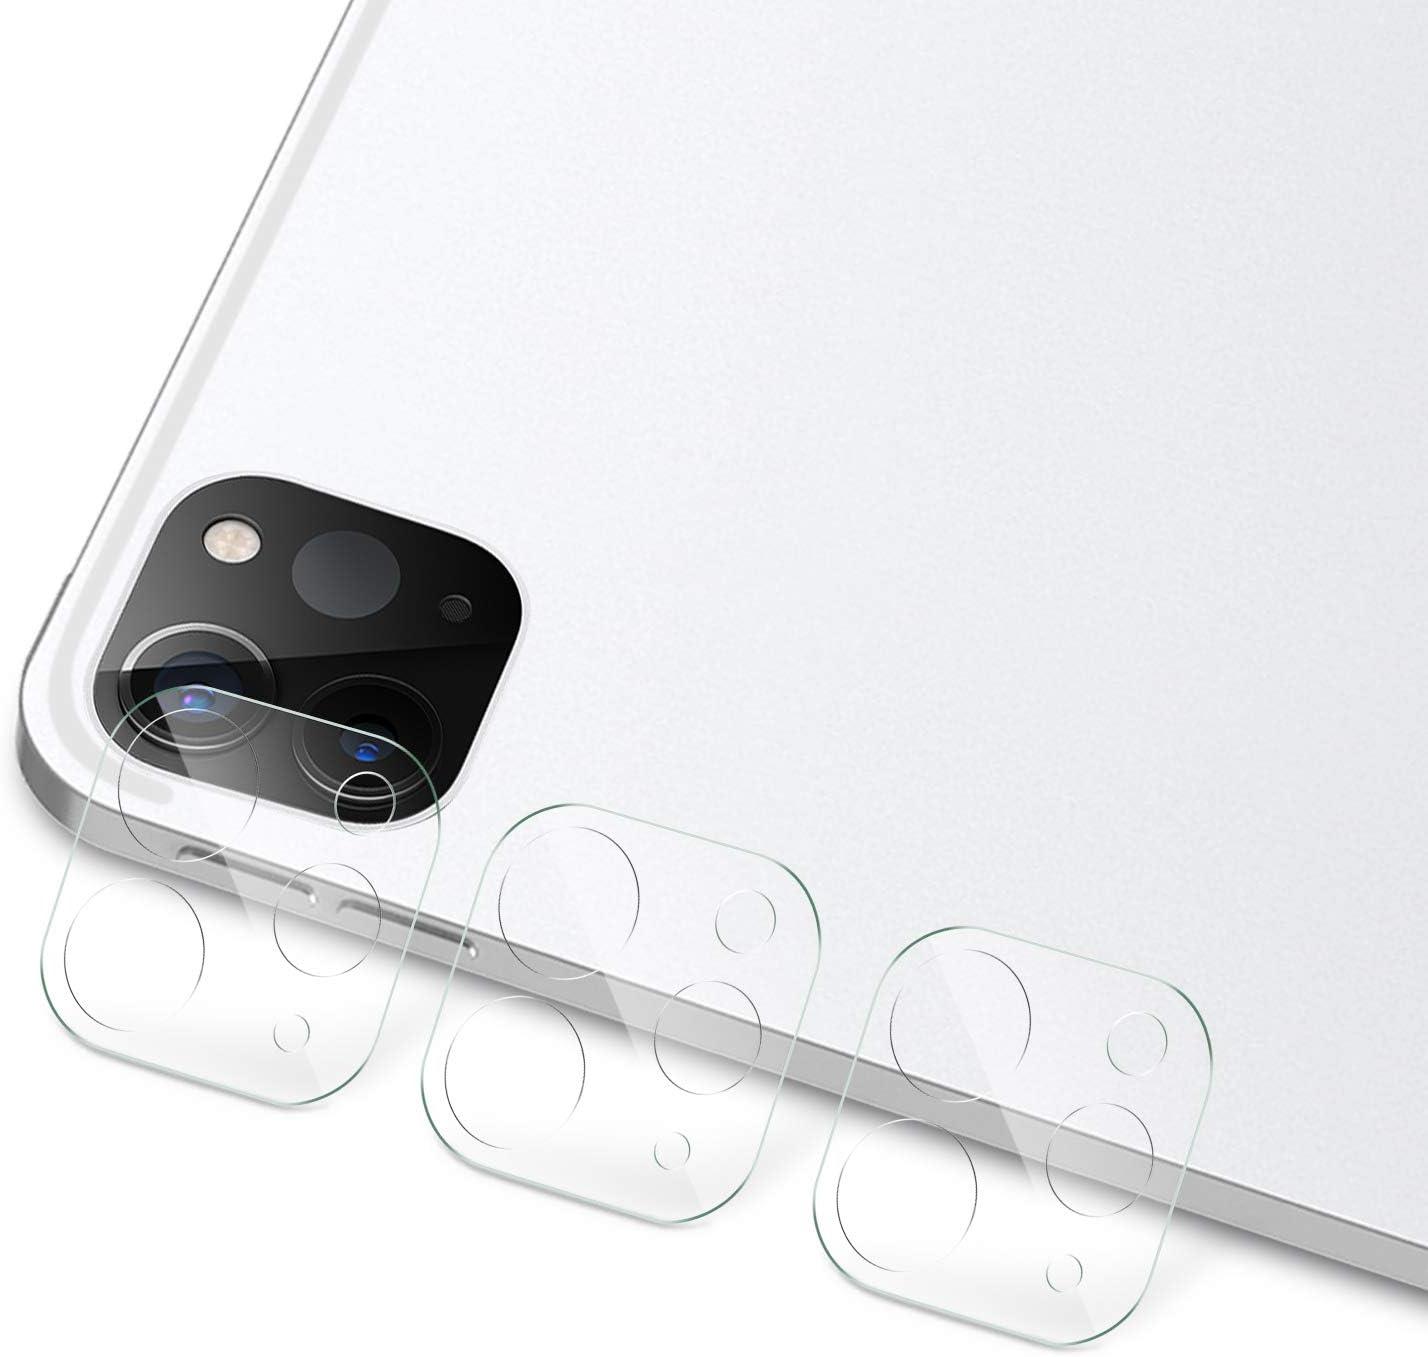 IVSO Protector de Lente de Cámara para iPad Pro 11 2020/iPad Pro 12.9 2020, Premium Lente de Cámara Protector de Pantalla para iPad Pro 11 2020/iPad Pro 12.9 2020, 3 Pack